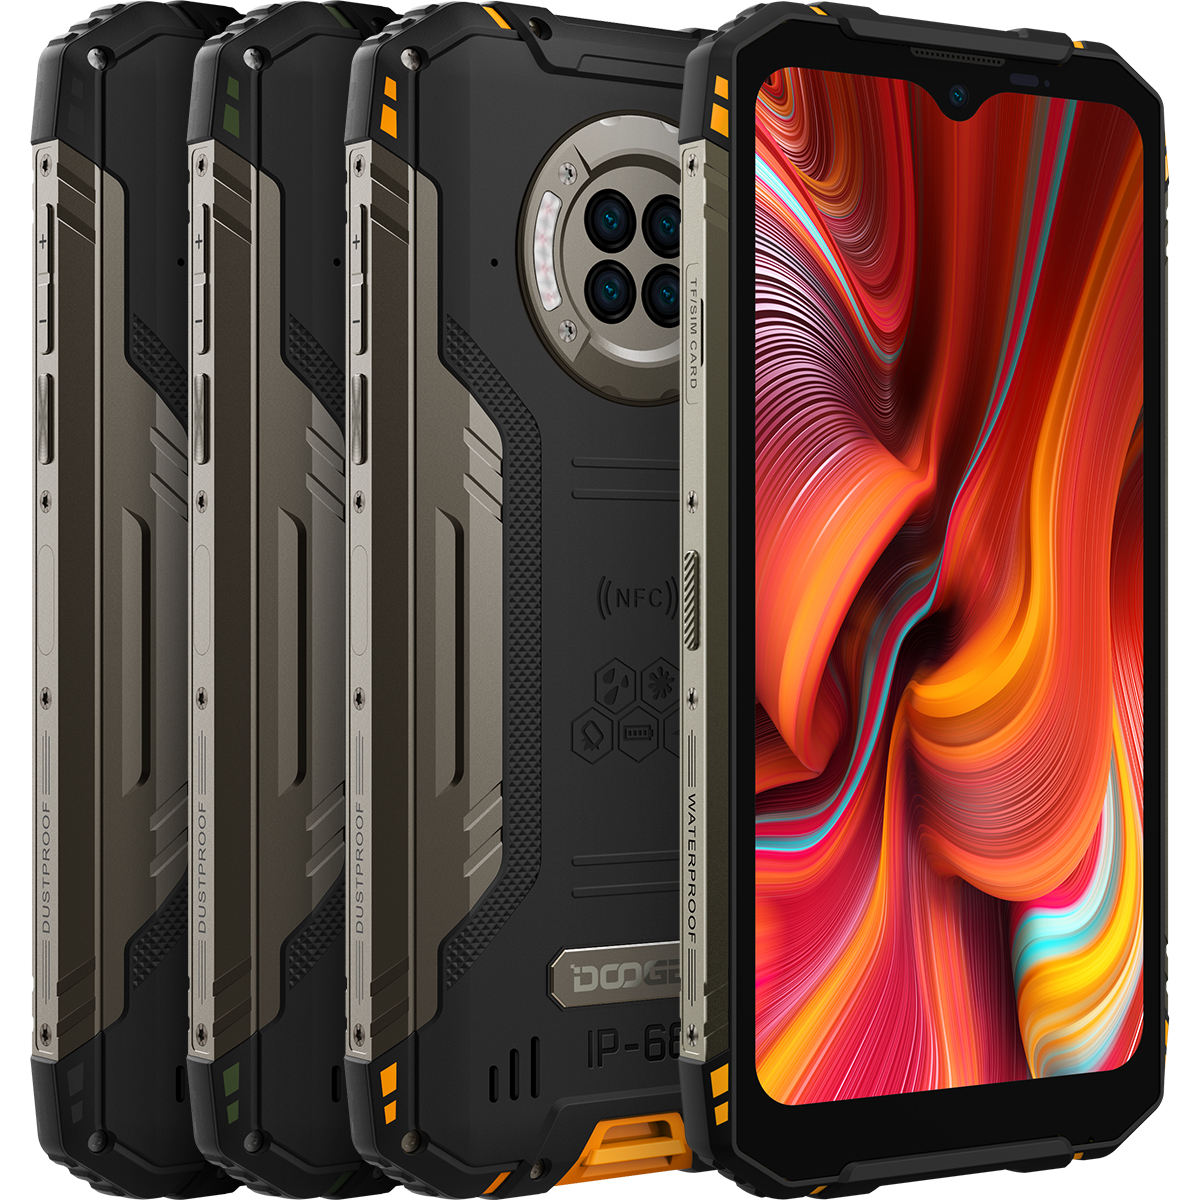 new Full Netcom 6350mAh Large battery 8GB+128GB doogee S96 Pro fingerprint mobile phone 5g mobile phones mobiles smart phones